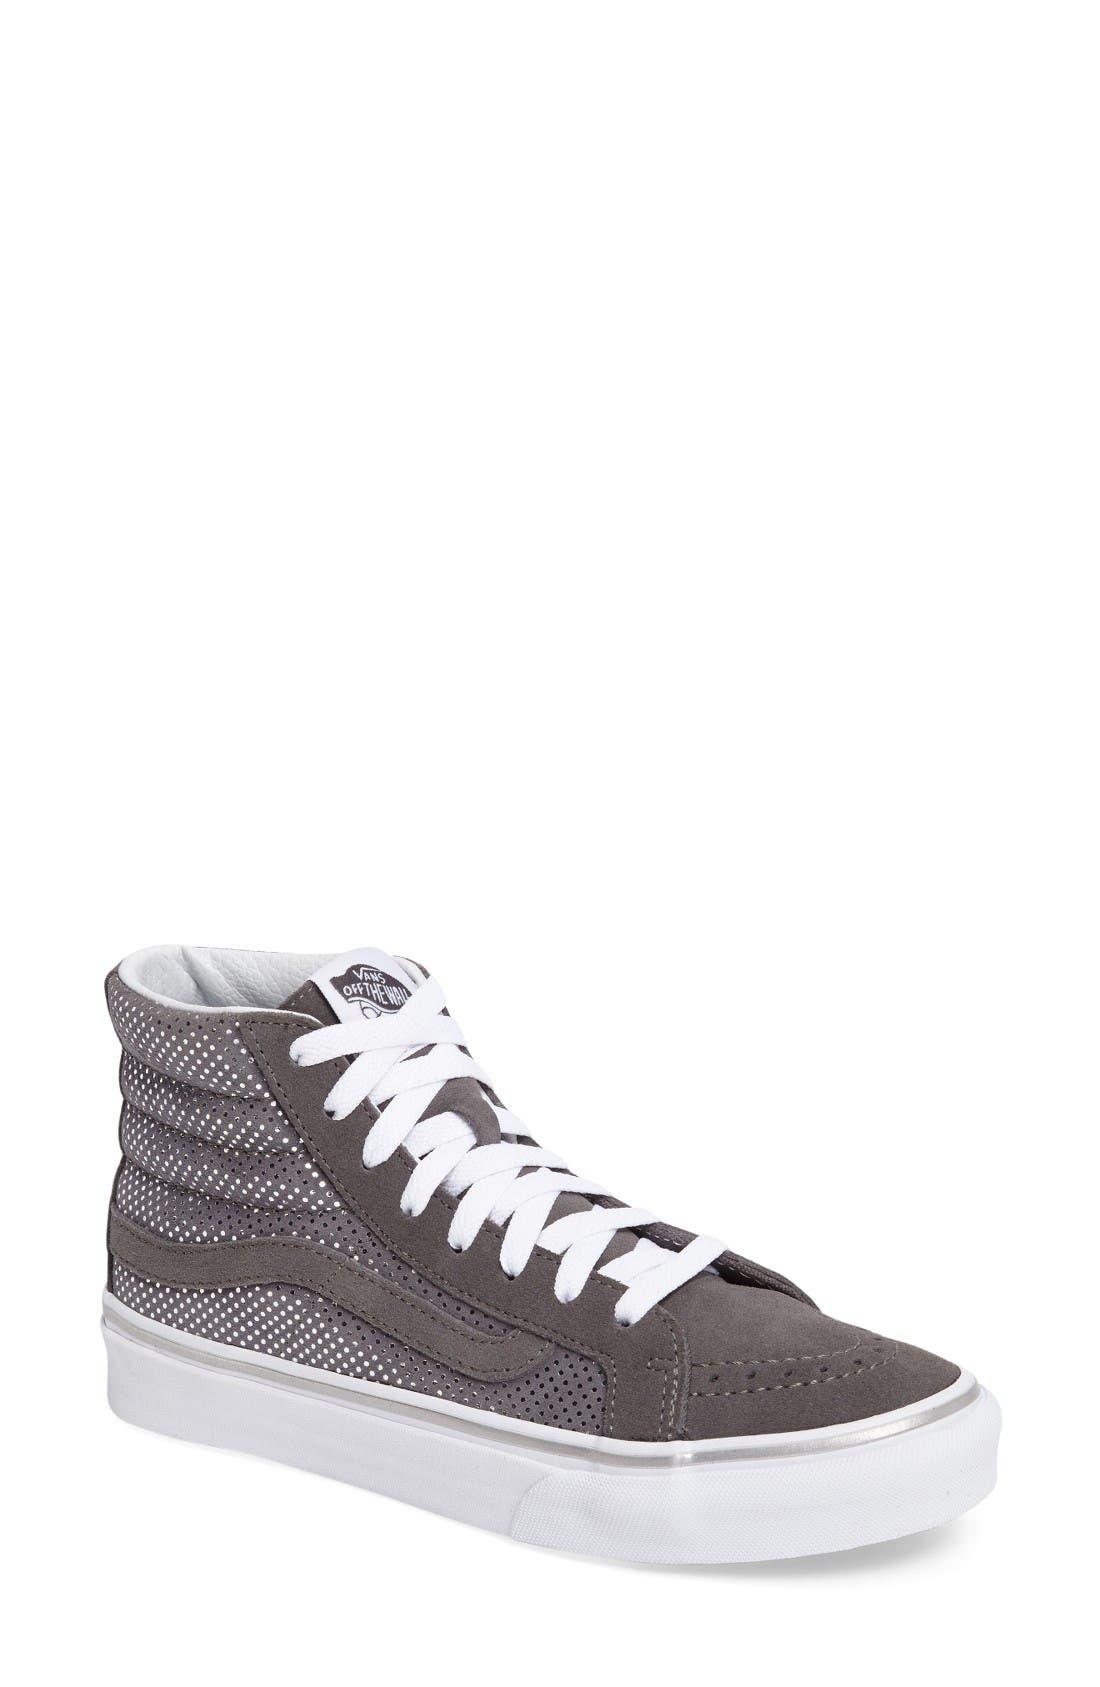 Alternate Image 1 Selected - Vans Sk8-Hi Slim High Top Sneaker (Women)